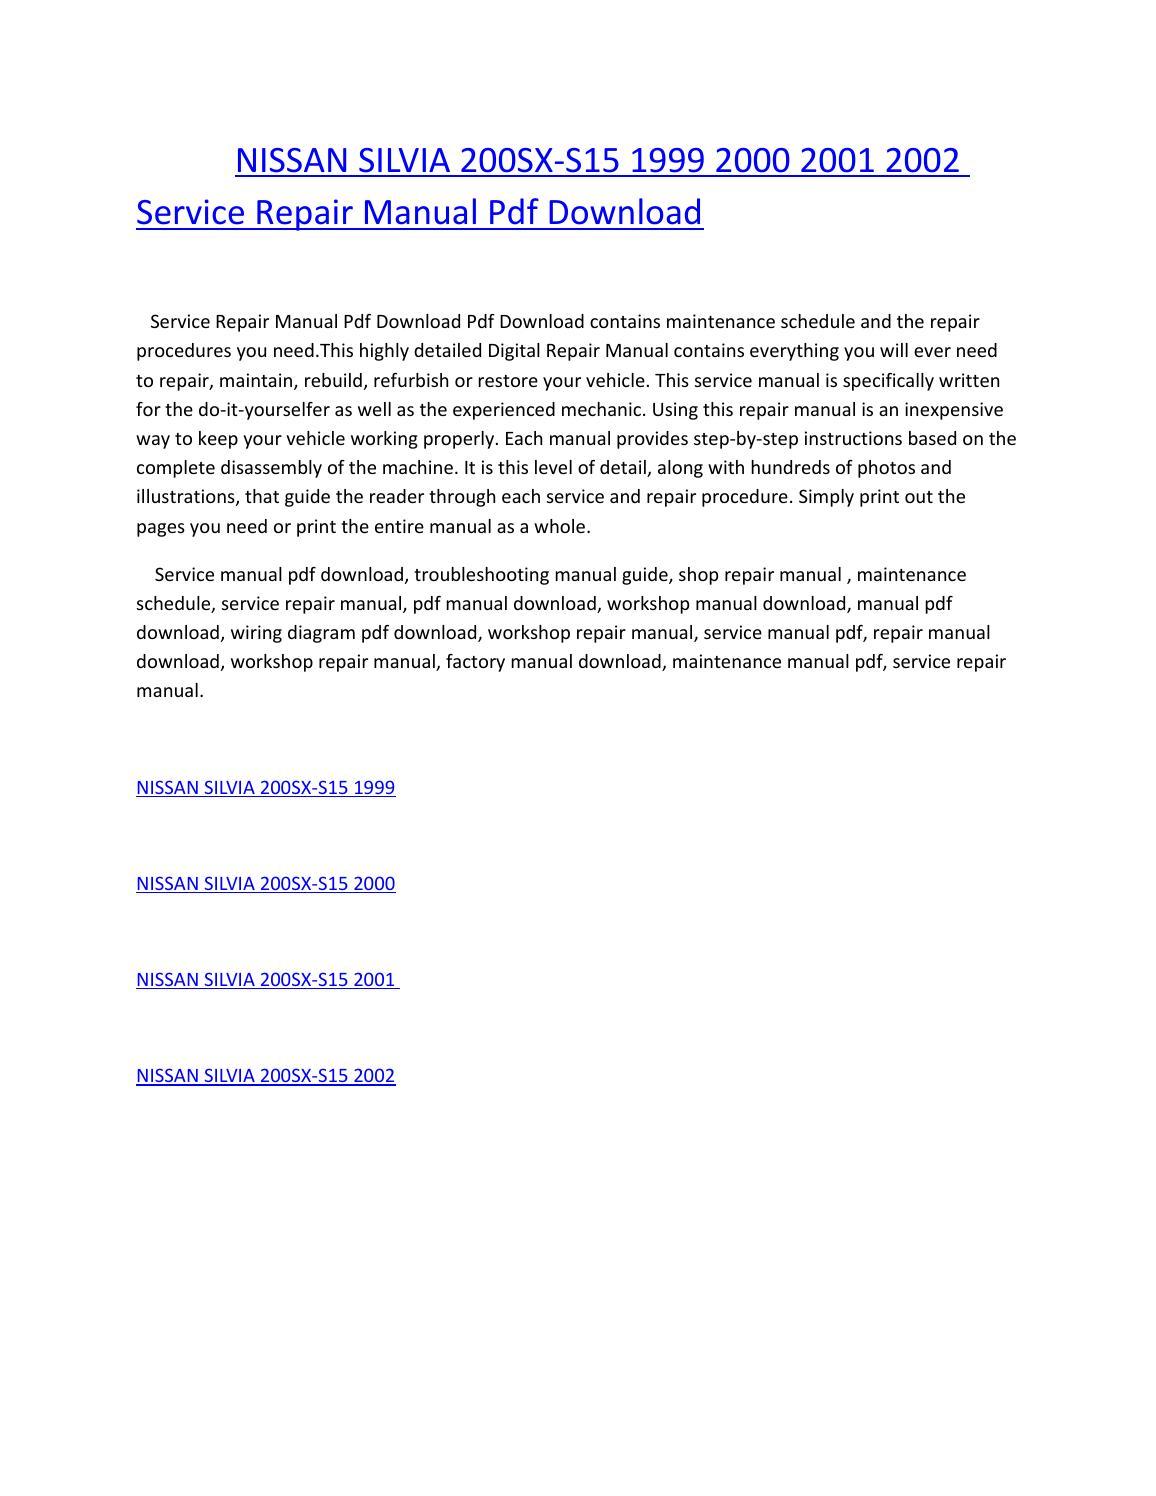 Nissan silvia 200sx s15 1999 2000 2001 2002 service repair manual pdf  download by amurgului - issuu